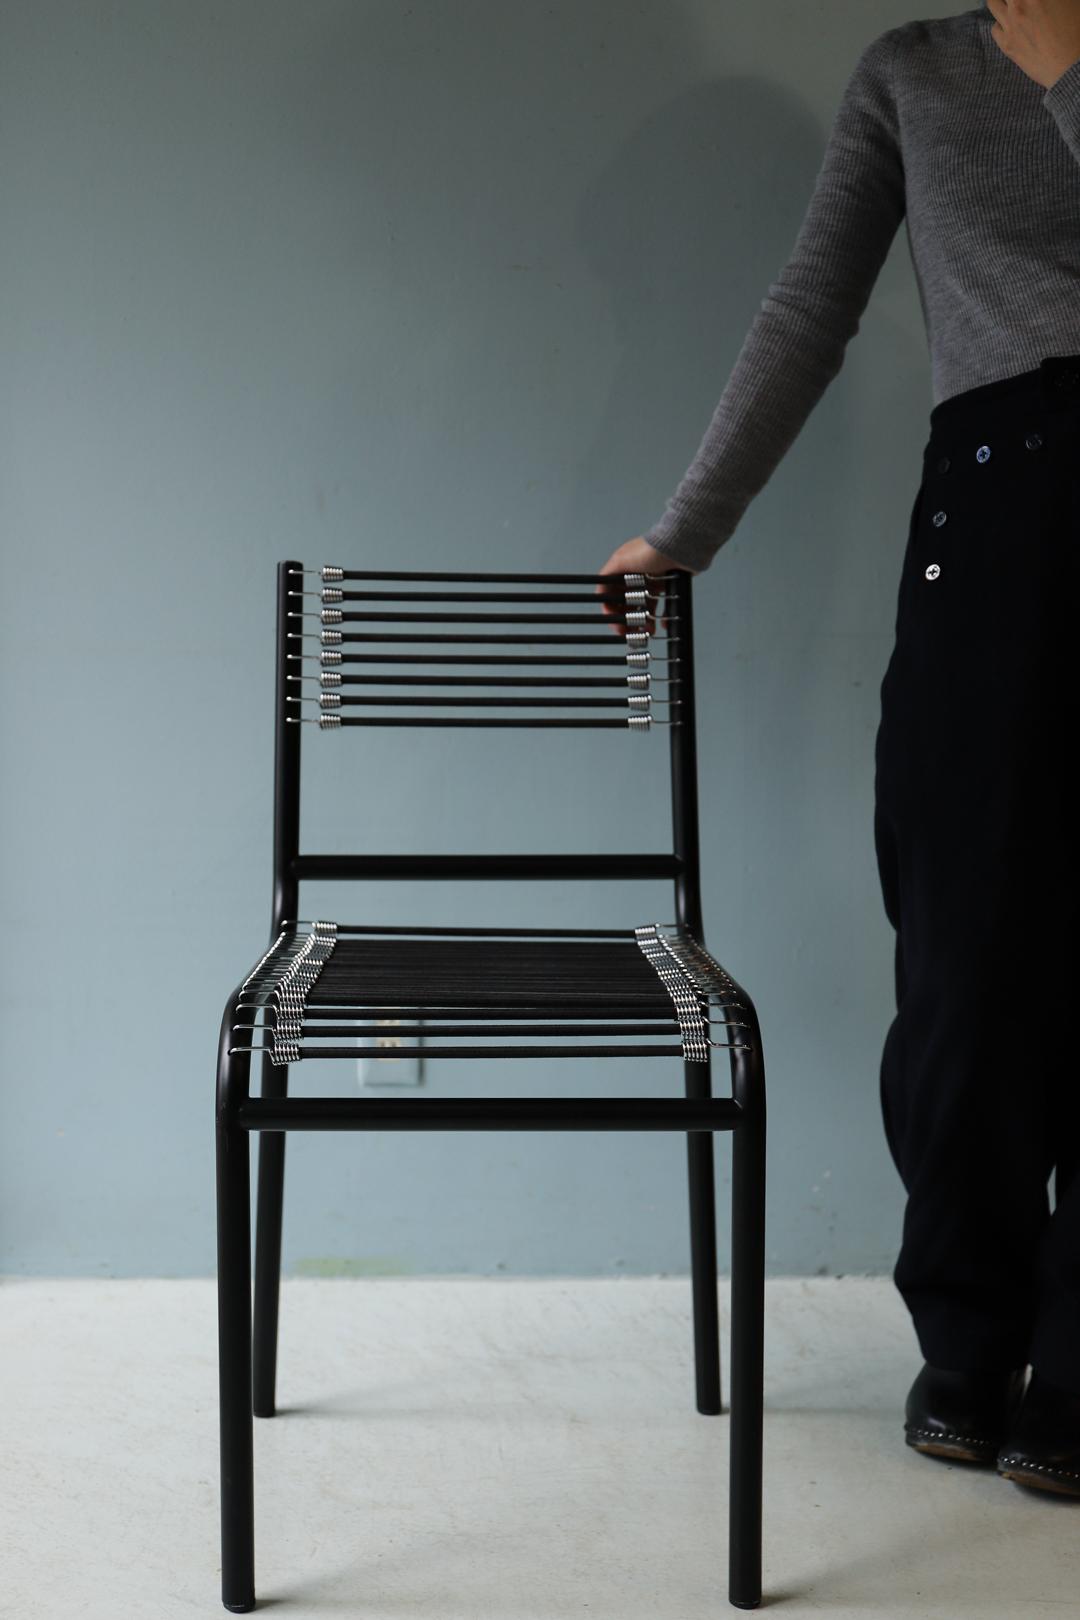 René Herbst Sandows Chair/ルネ・エルブスト サンドウズチェア ダイニングチェア 椅子 ブラック モダンデザイン